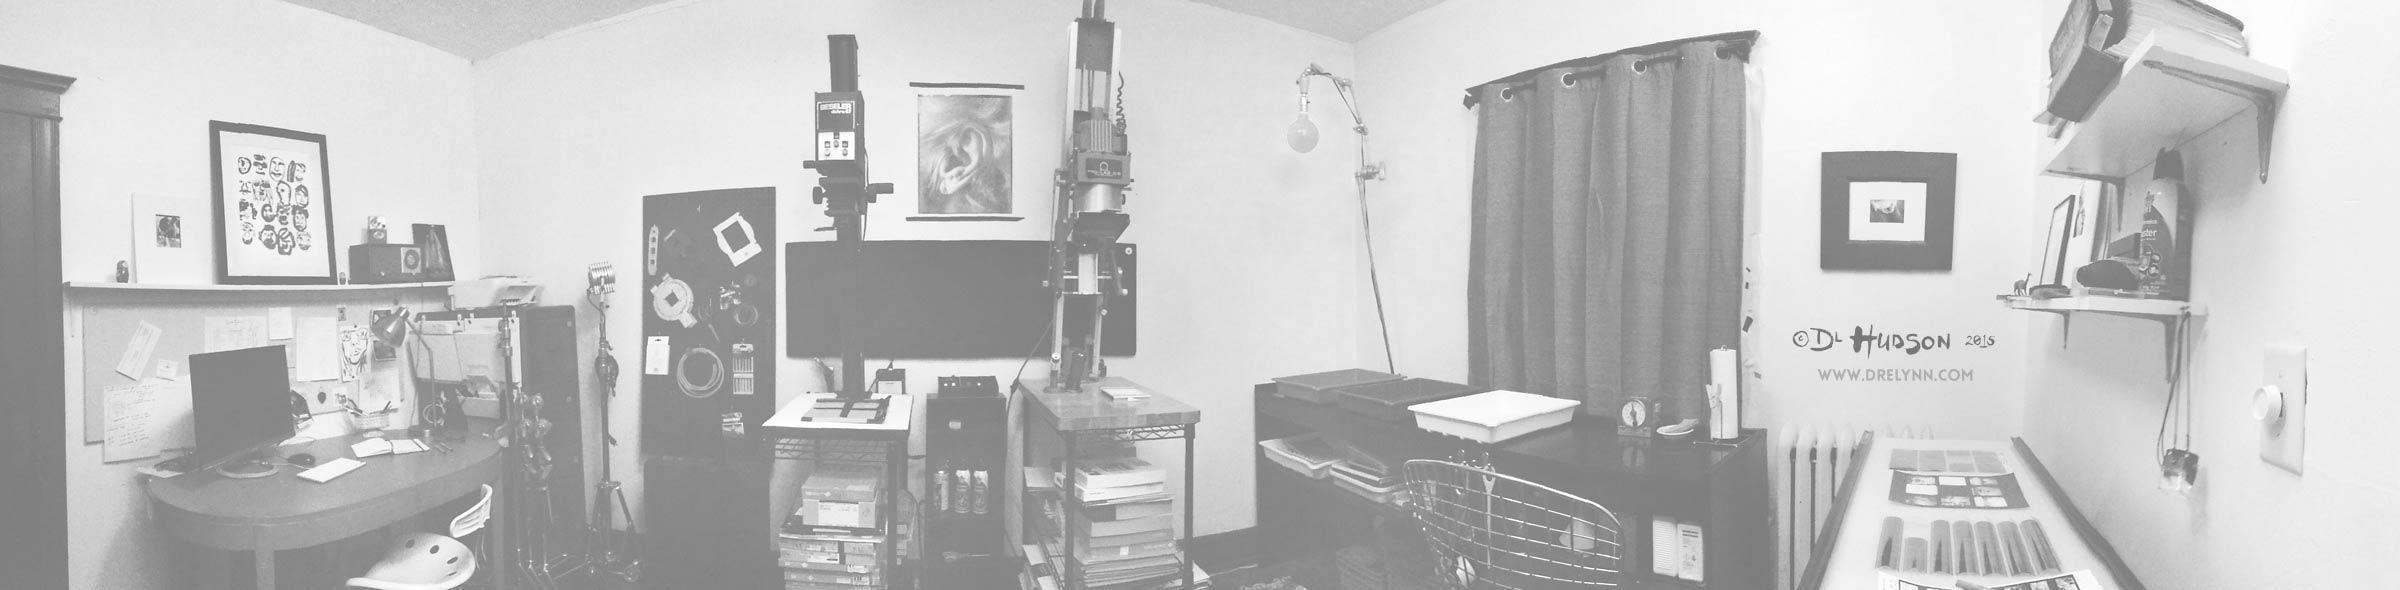 Apartment Darkroom v2.0